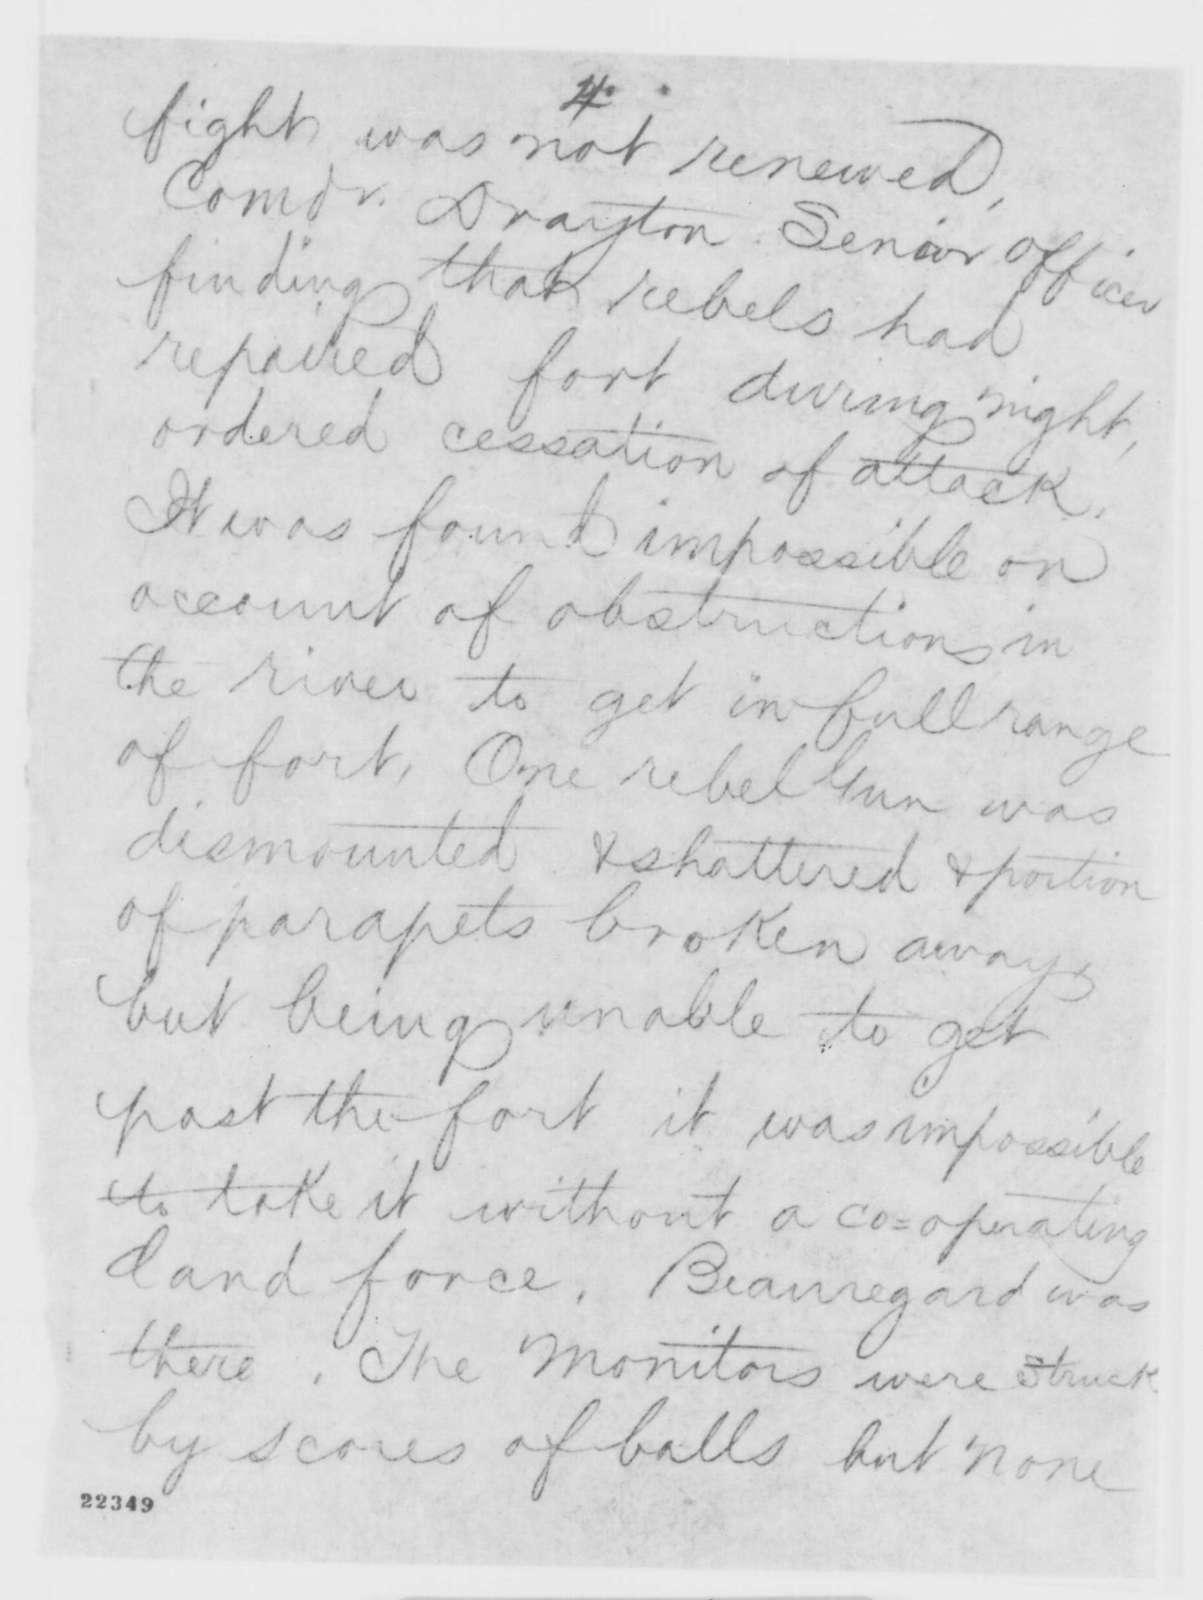 Charles C. Fulton to Gustavus V. Fox, Wednesday, March 11, 1863  (Telegram concerning naval affairs at Fort Monroe)